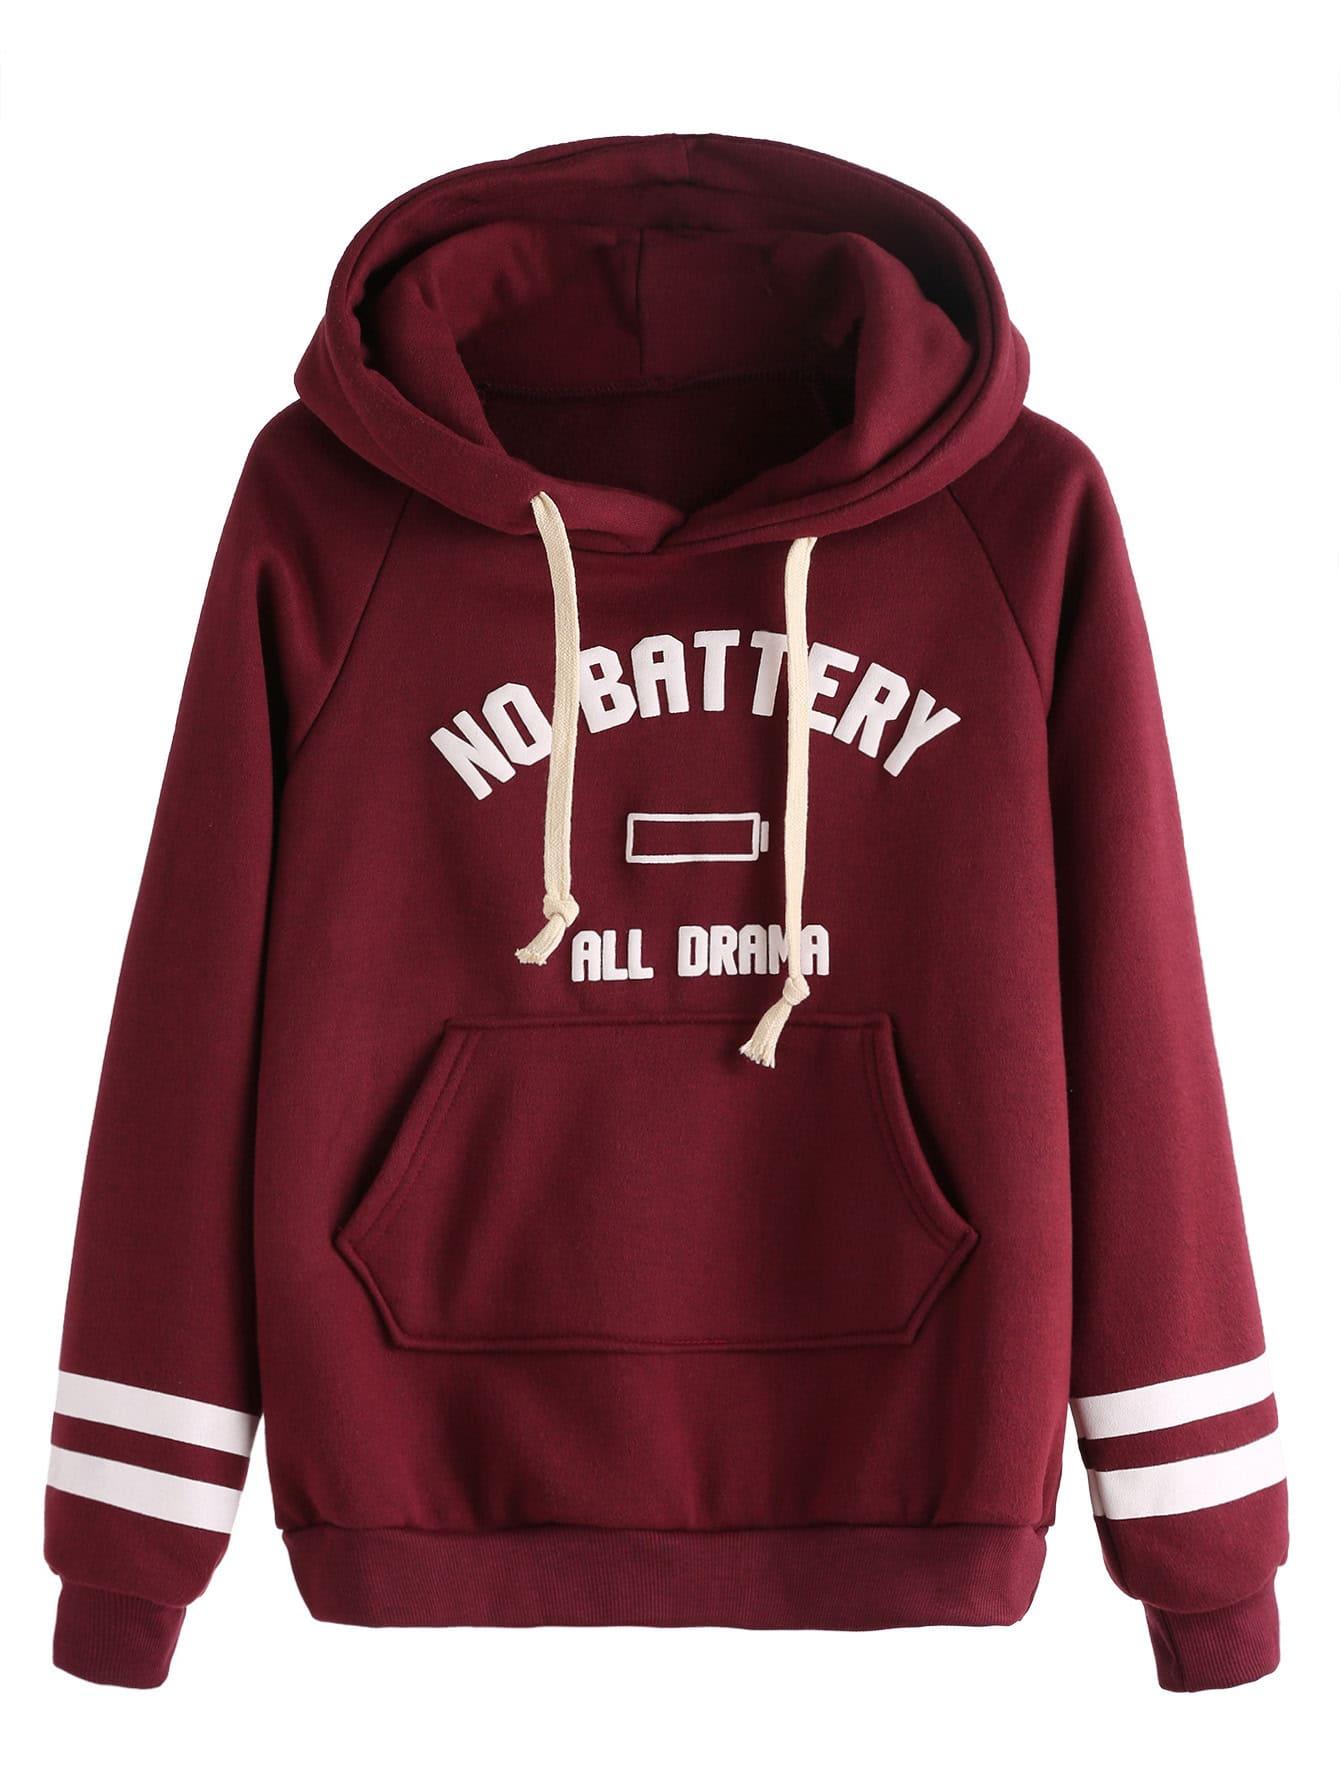 Letter Print Hooded Sweatshirt With Pocket sweatshirt160905026